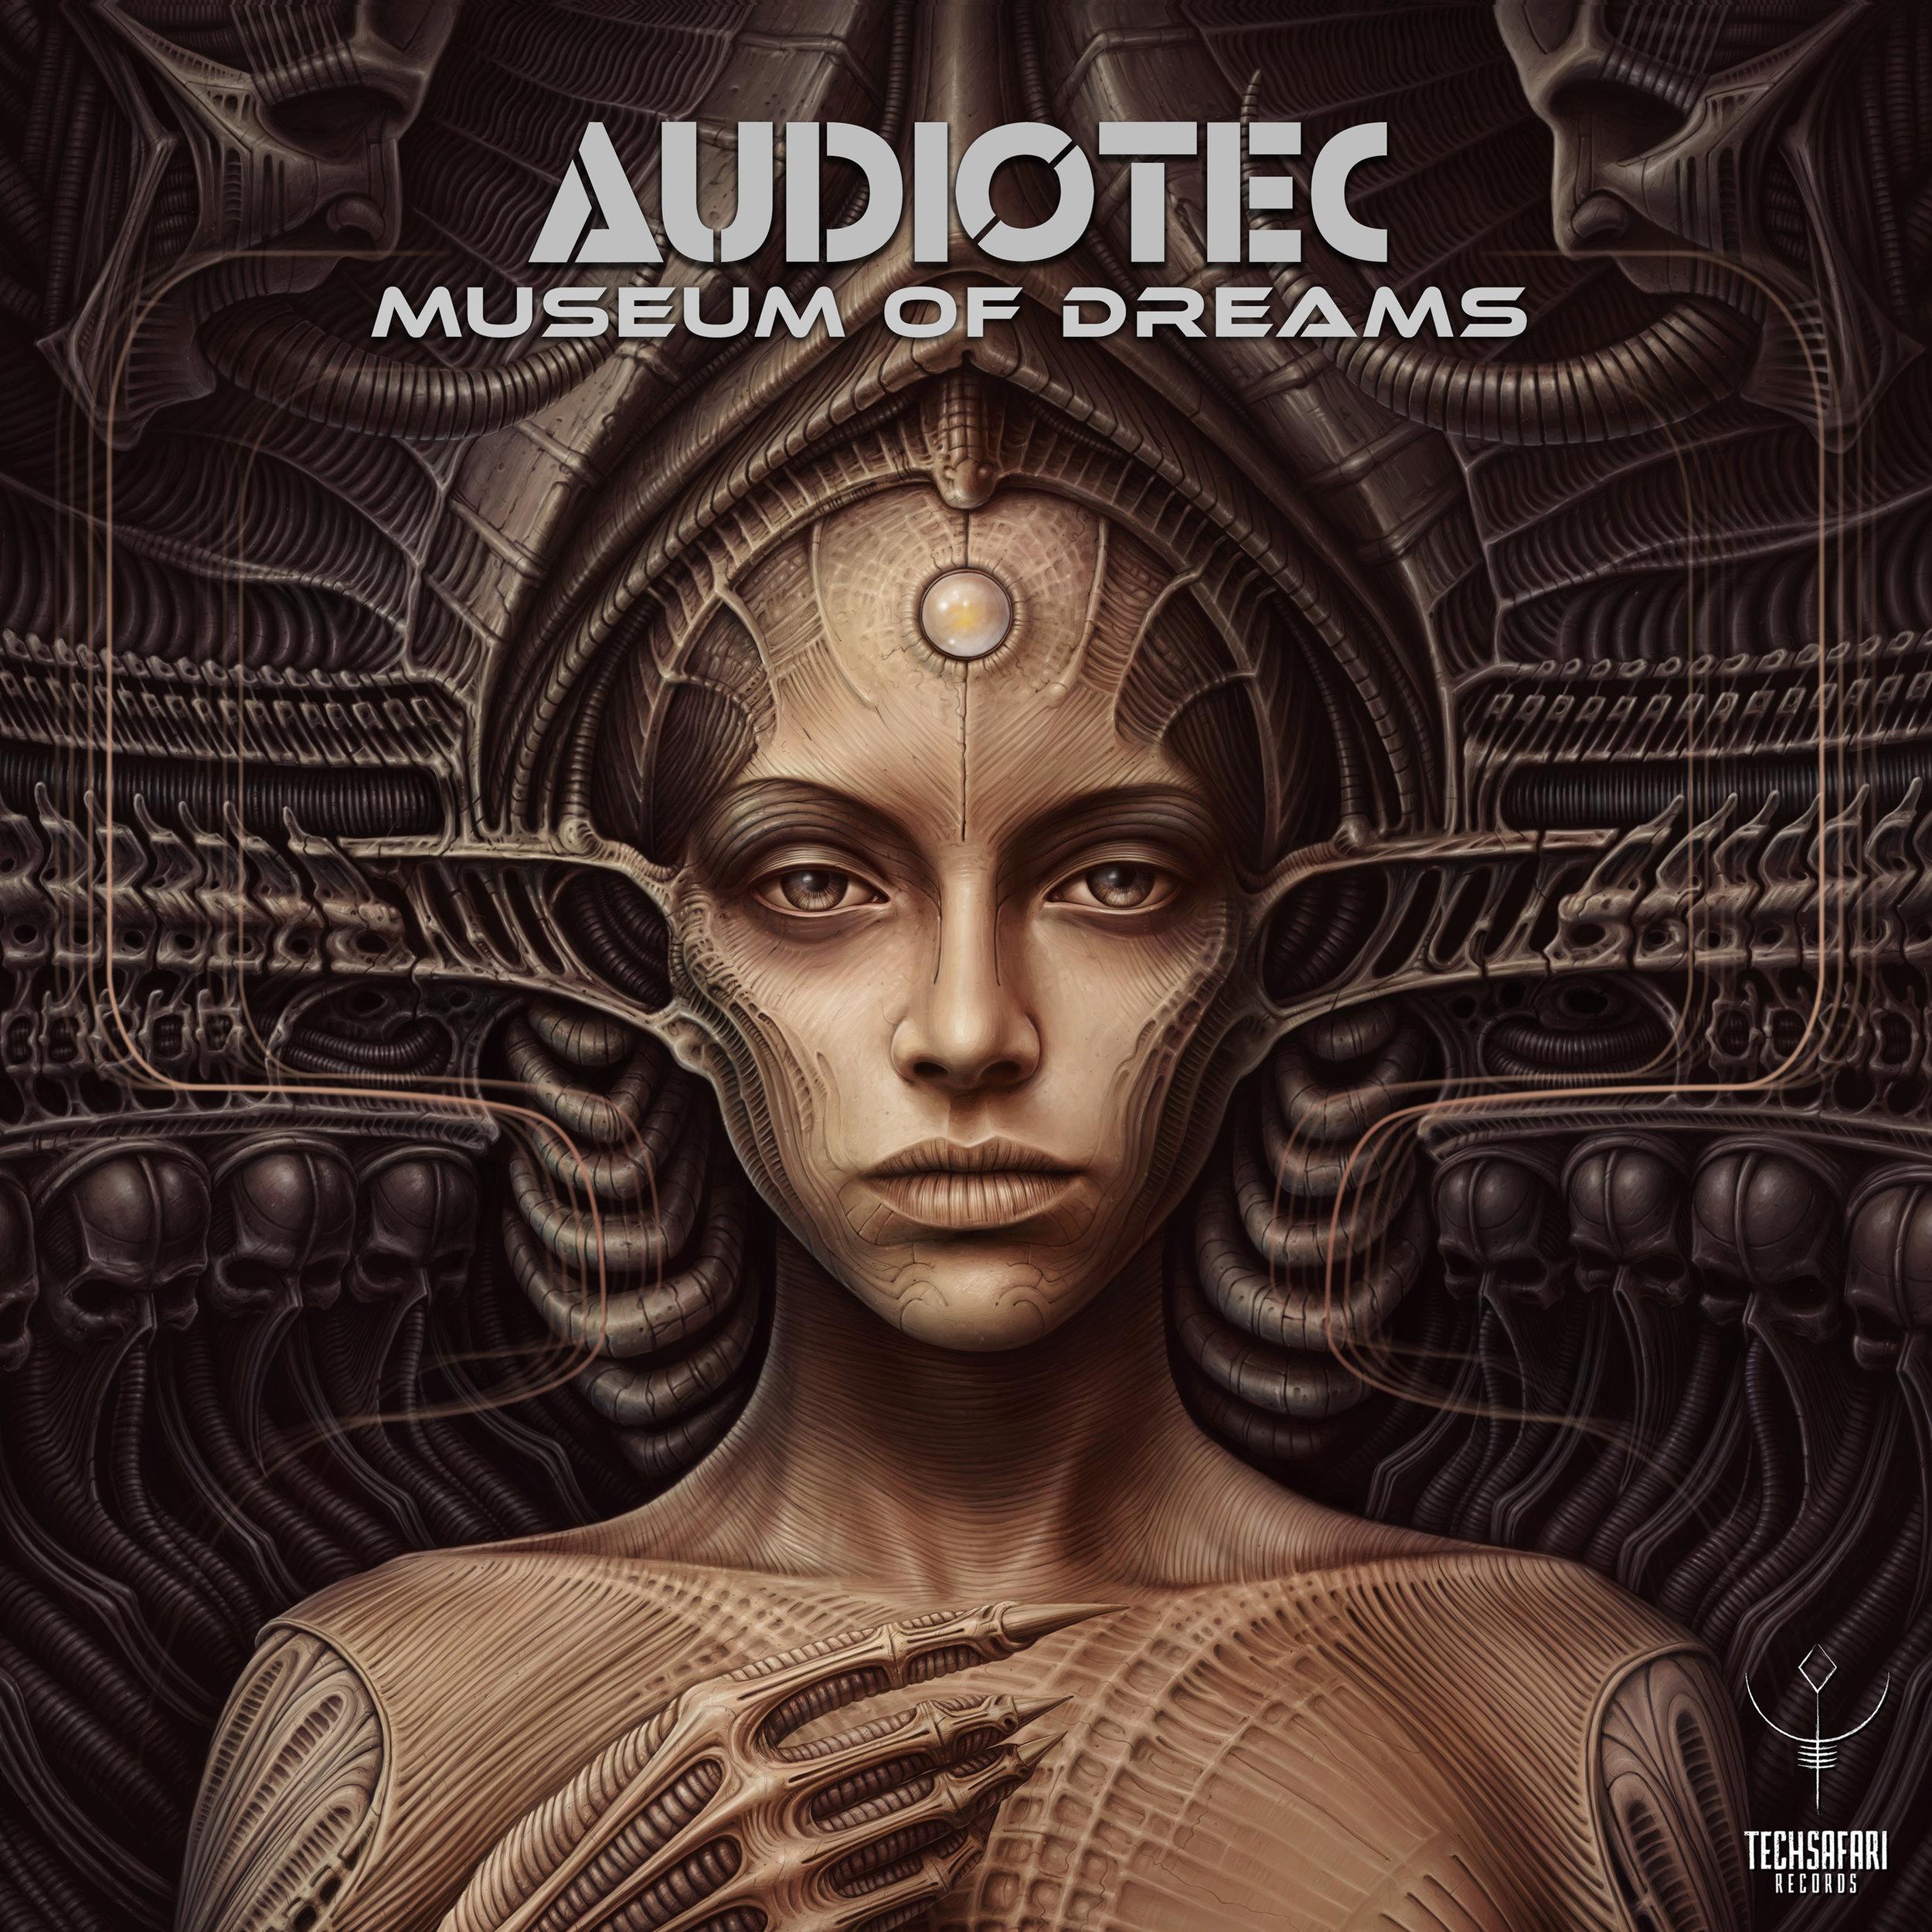 TSR65_Audiotec_Museum_of_dreams(1).jpg